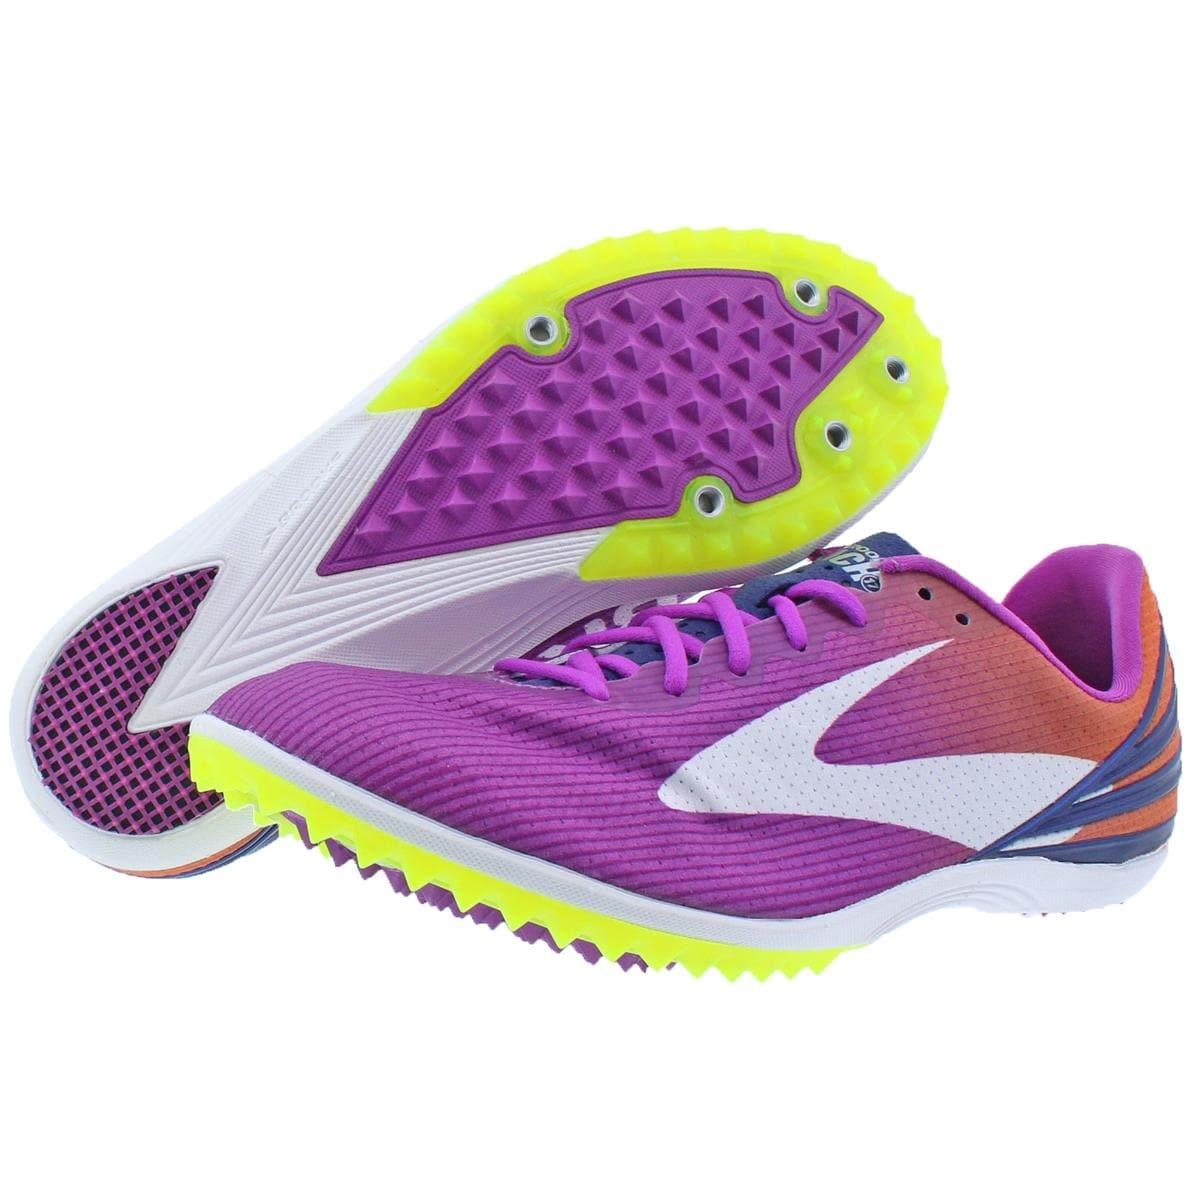 8500f17823d2e Shop Brooks Womens Mach 17 Spike Running Shoes Track Cross Country - 6  medium (b